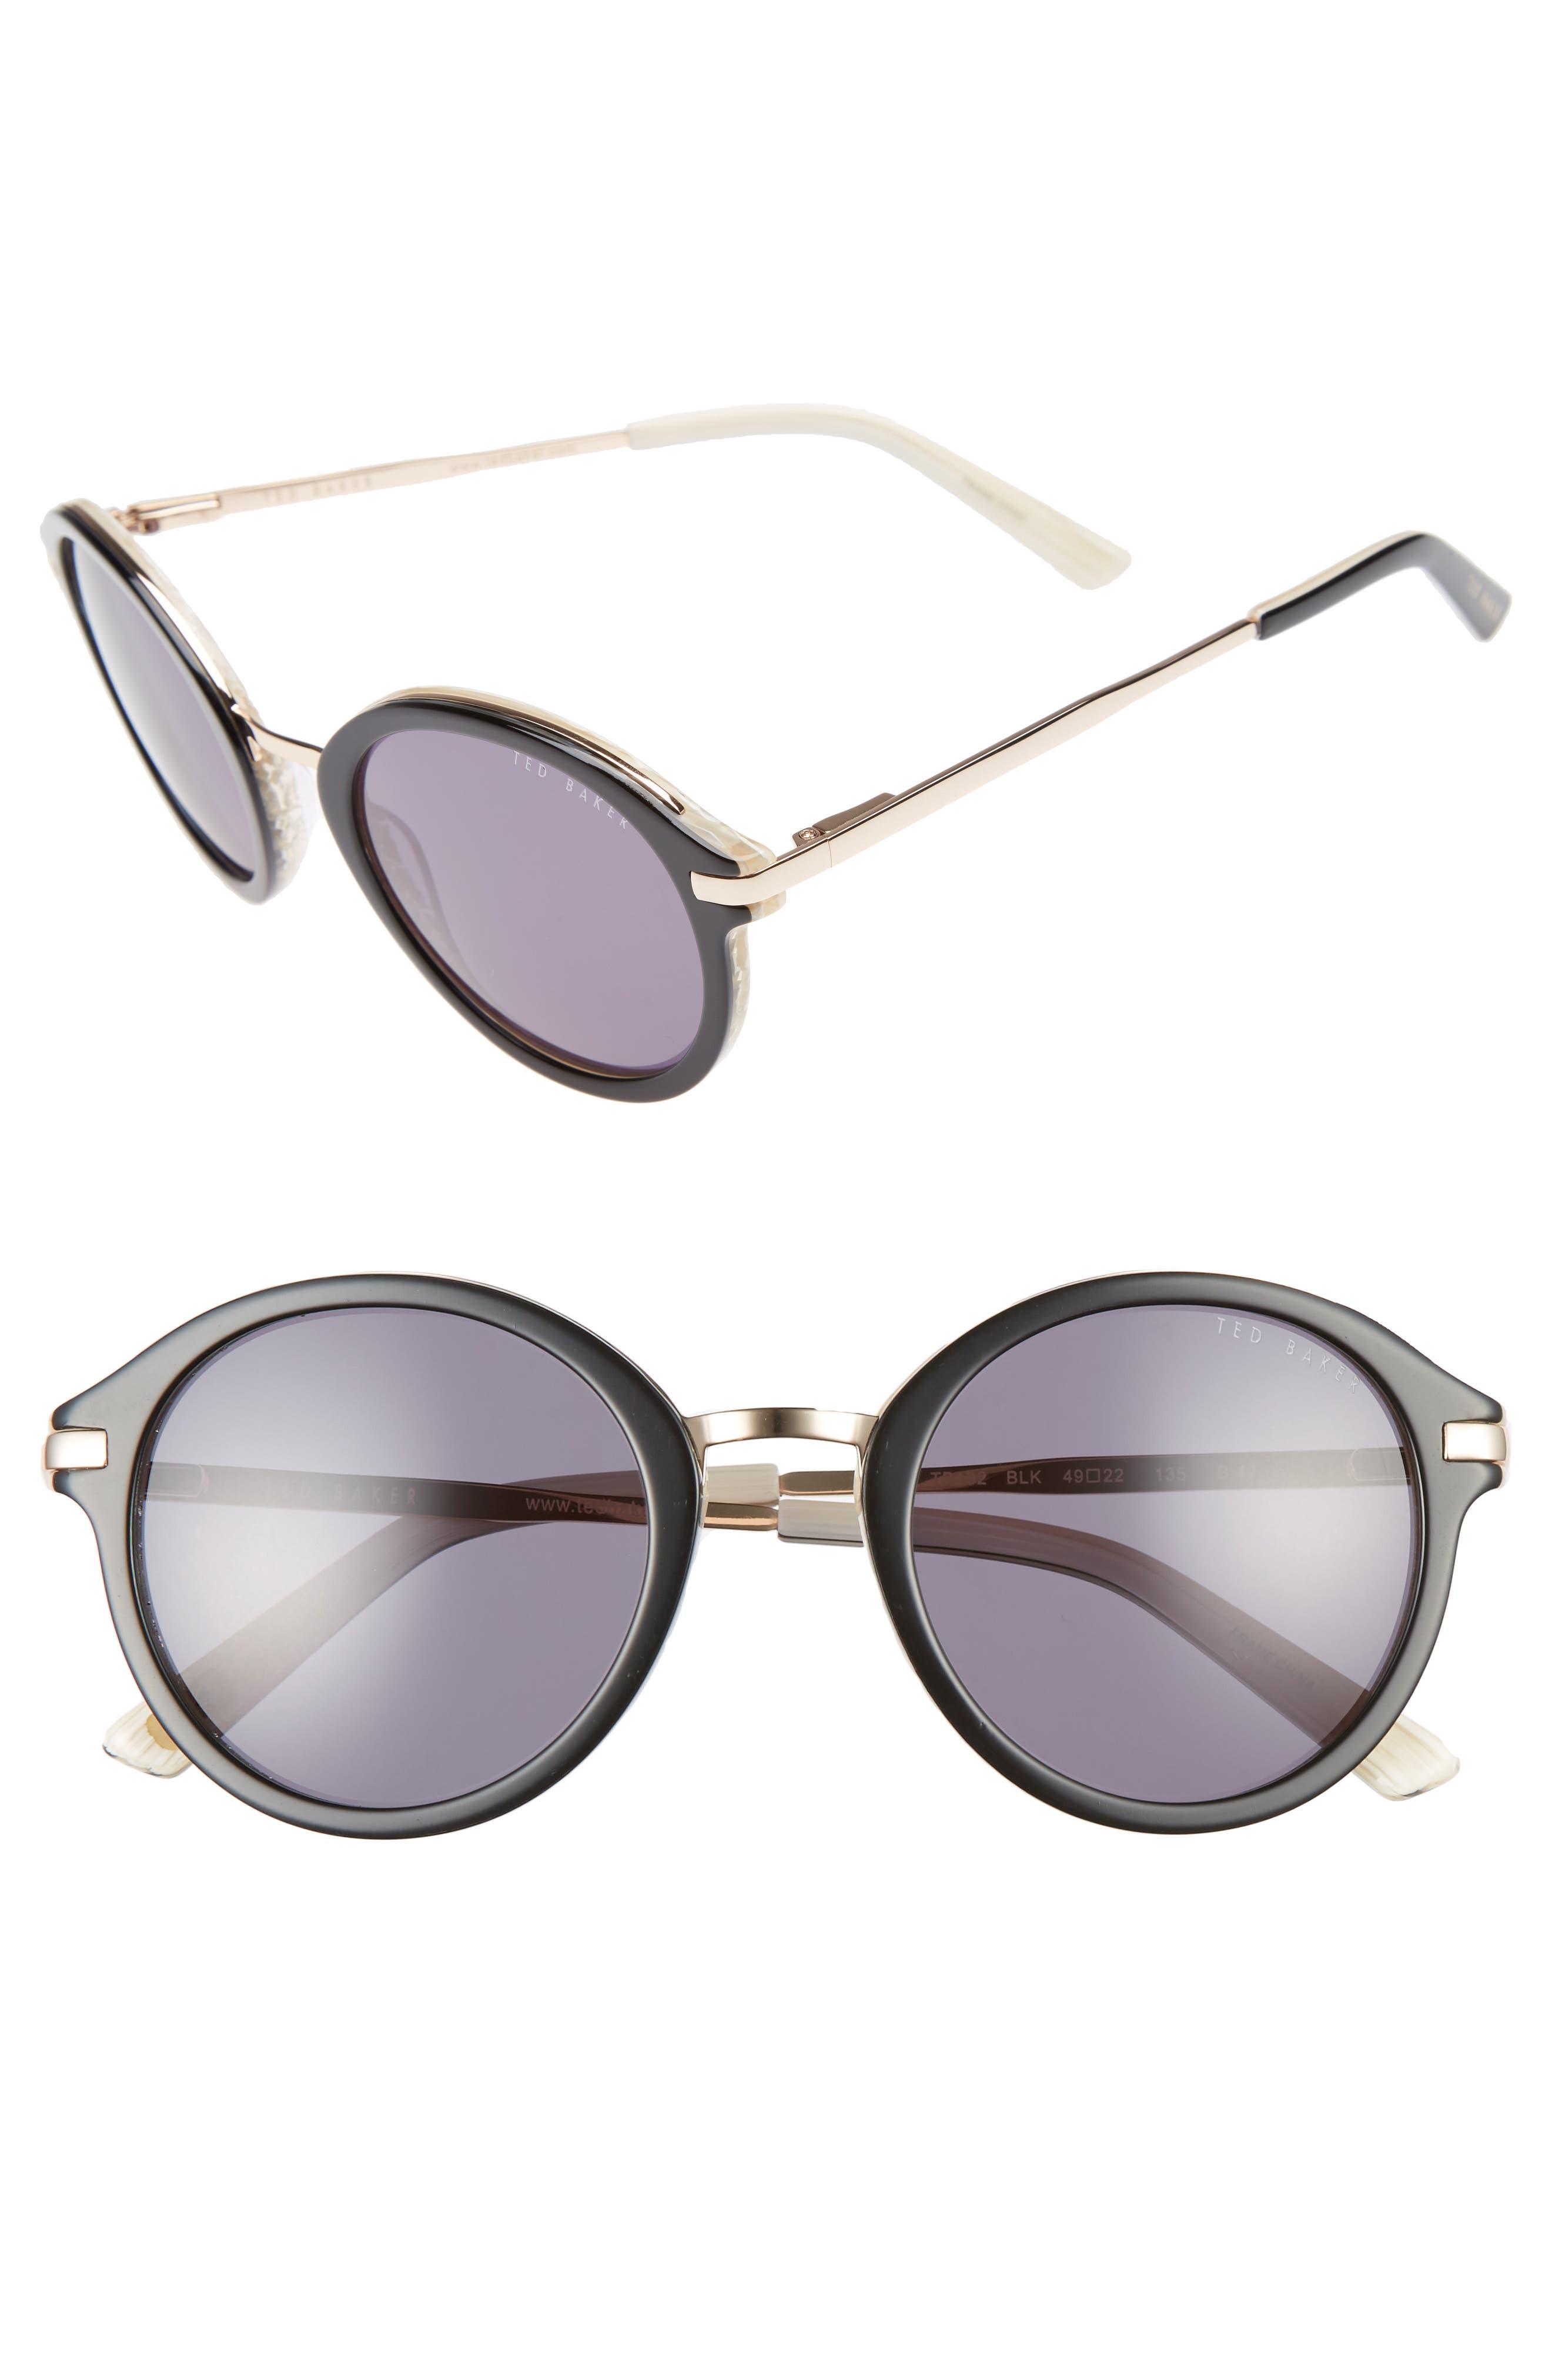 49mm Round Sunglasses,                             Main thumbnail 1, color,                             001